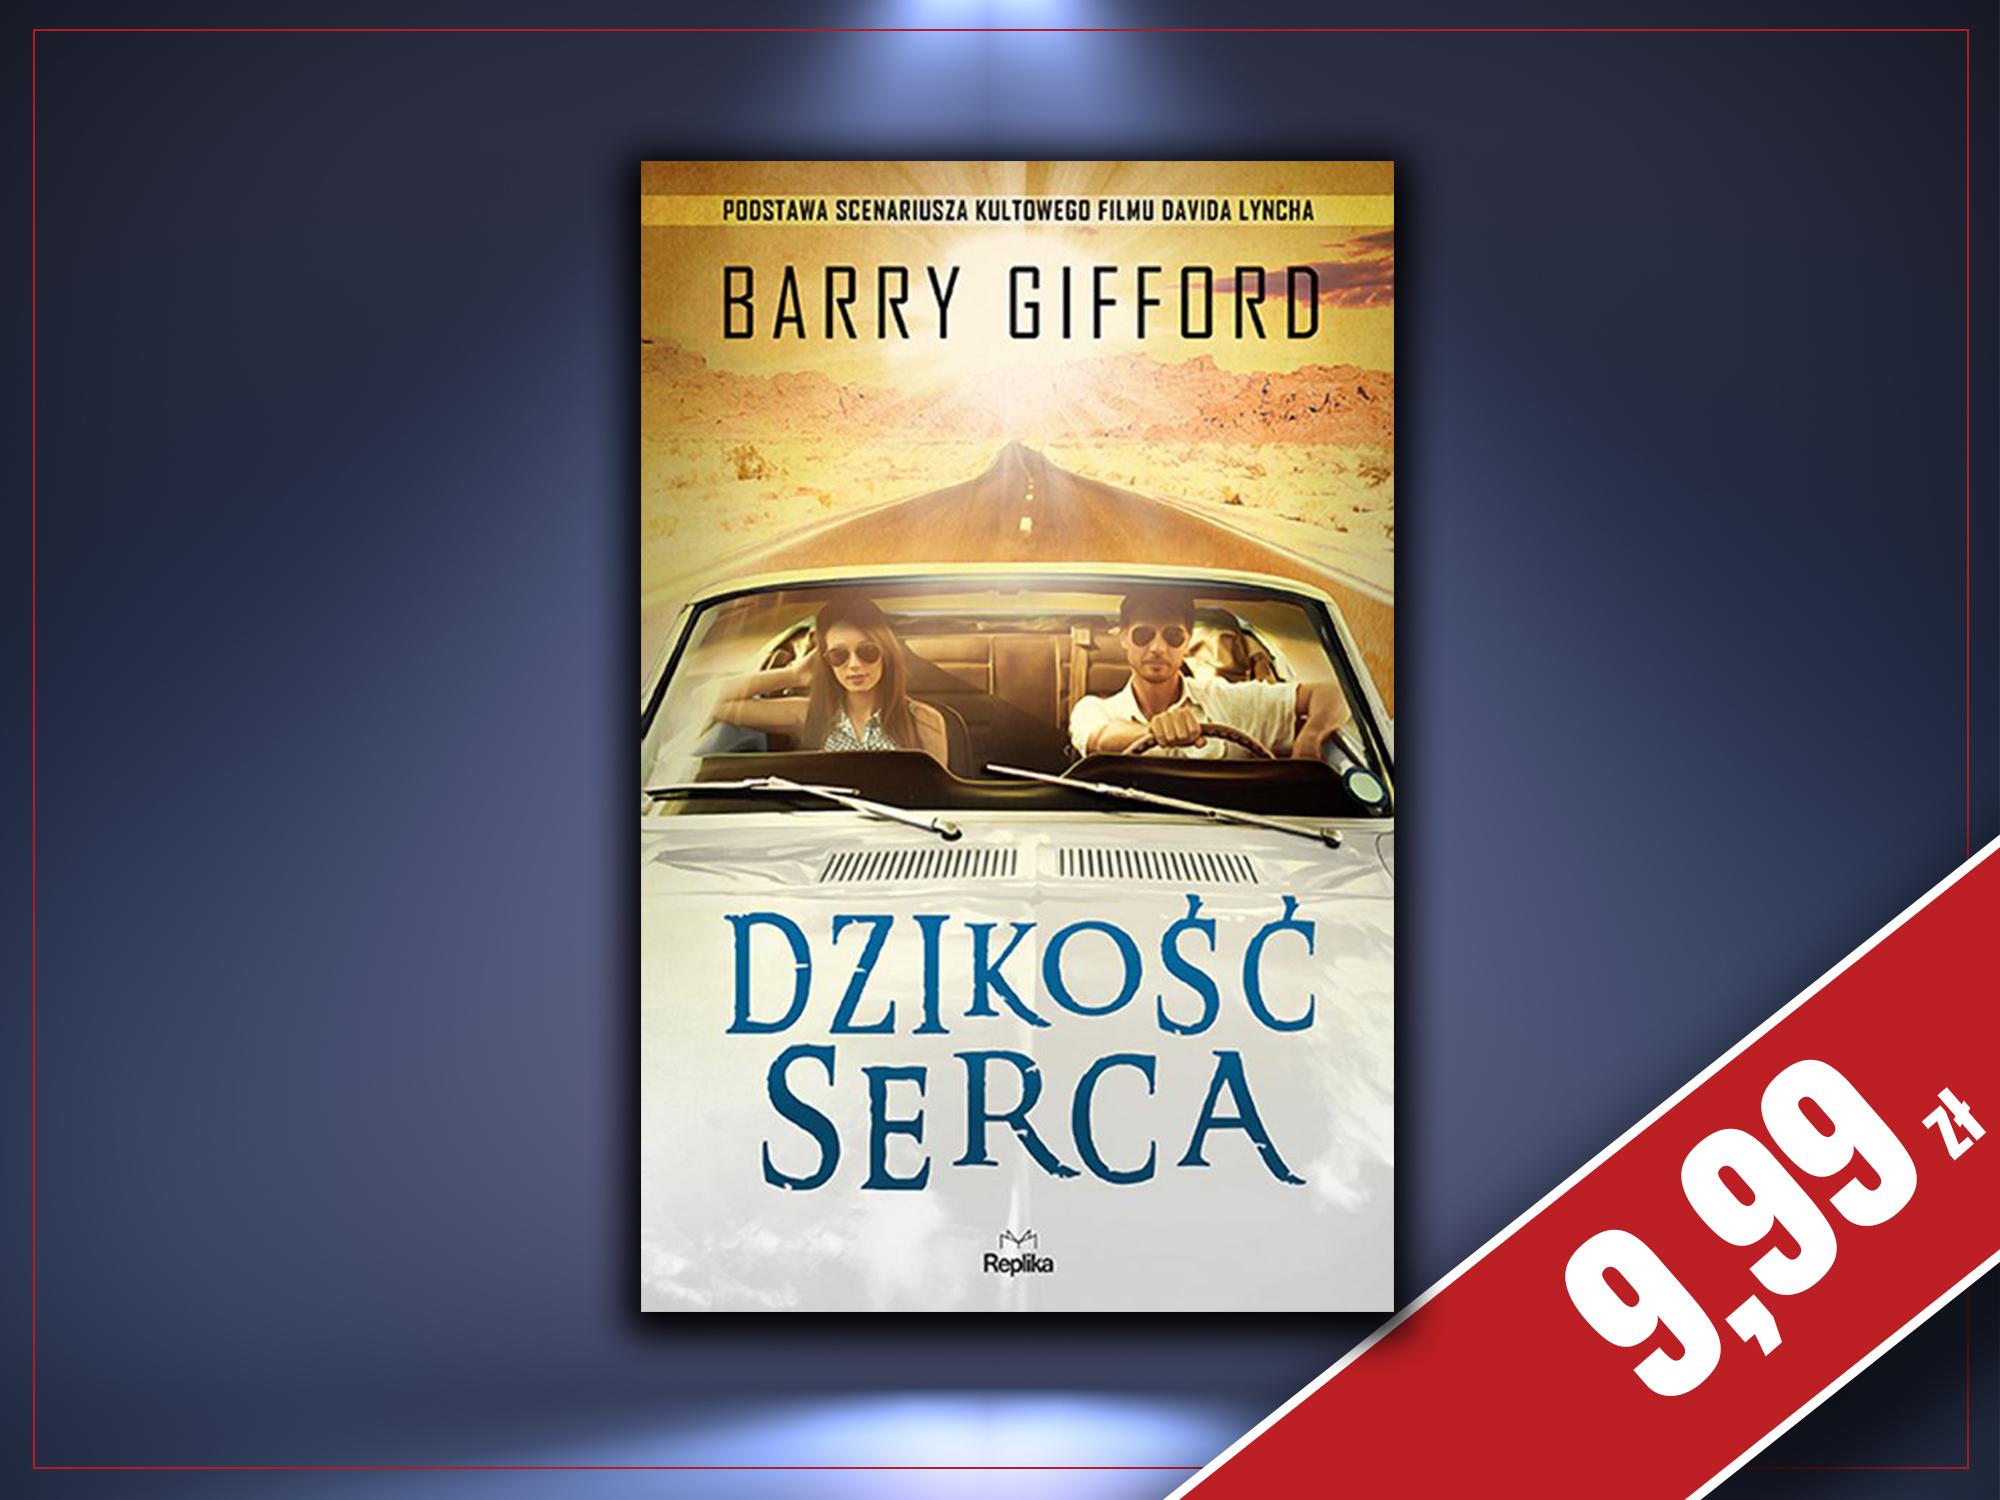 Dzikość serca, Barry Gifford